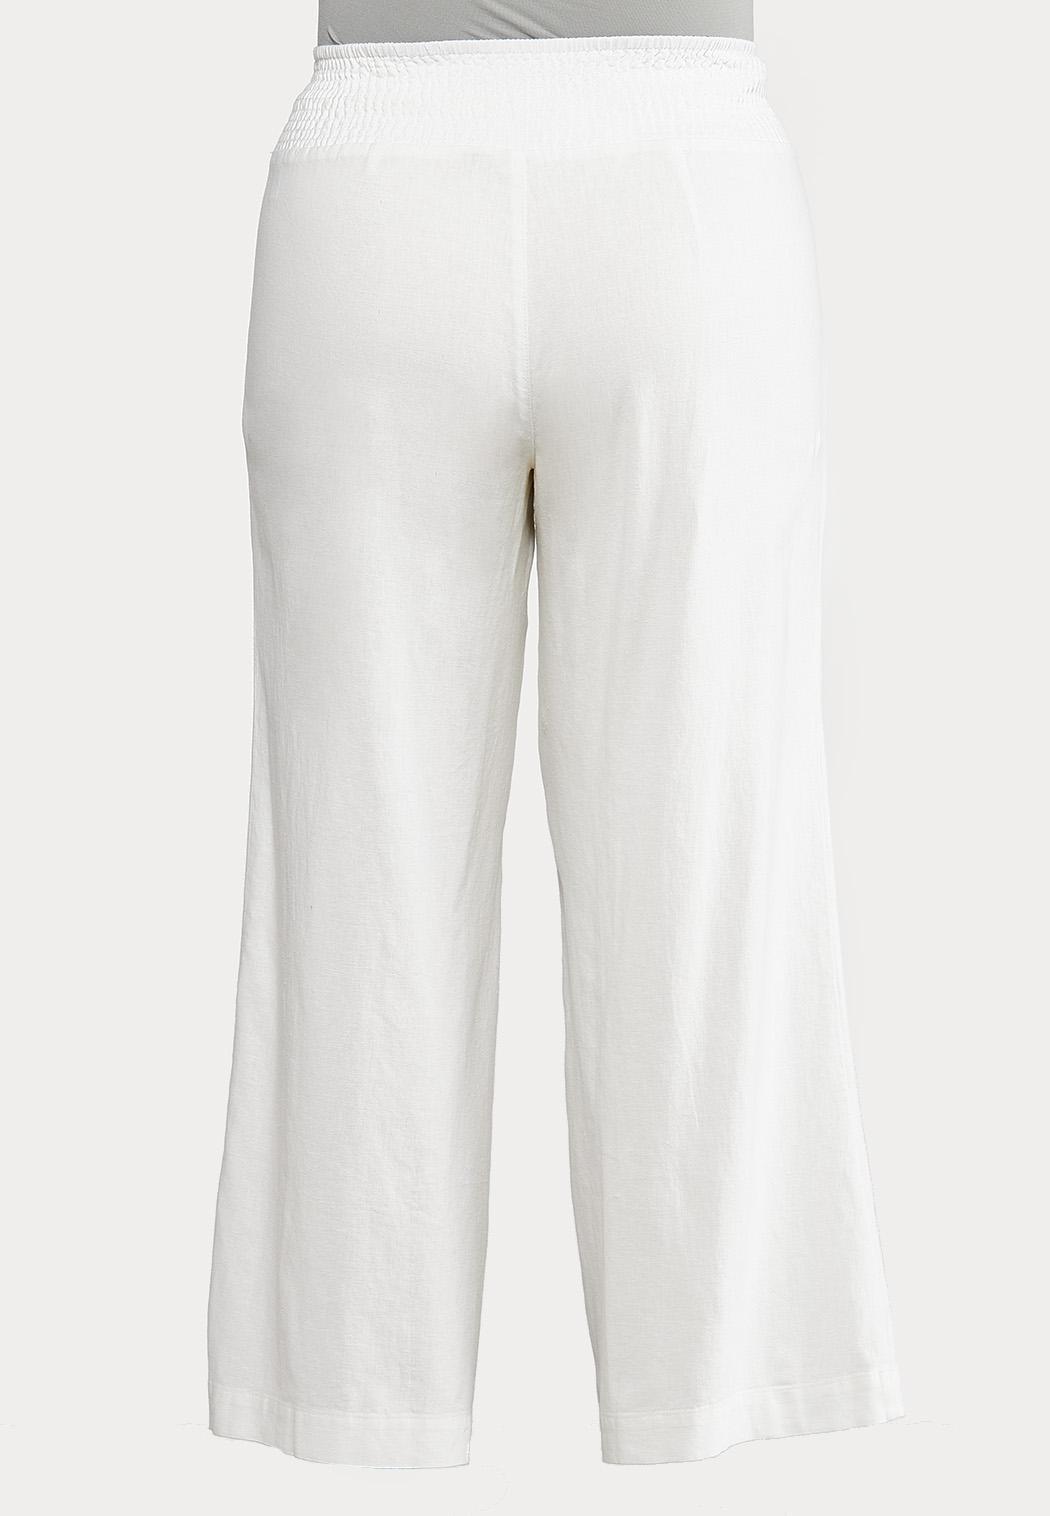 Plus Size Pull-On Linen Pants (Item #44508351)